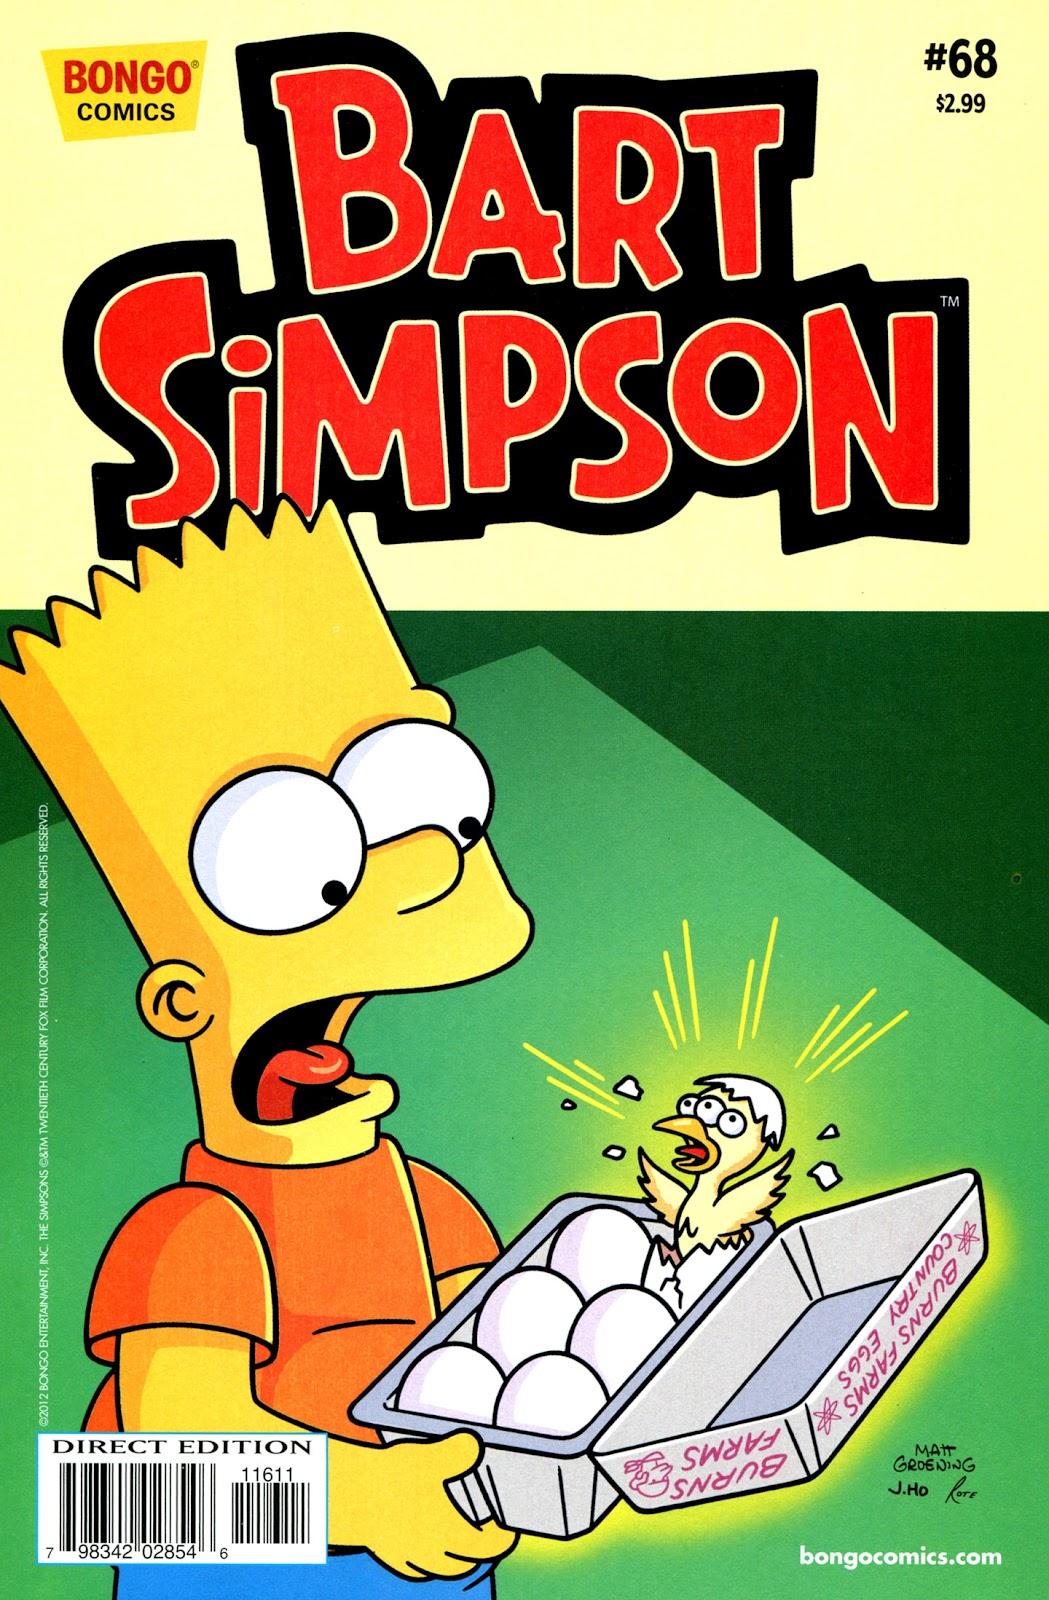 Simpsons Comics Presents Bart Simpson 68 Page 1